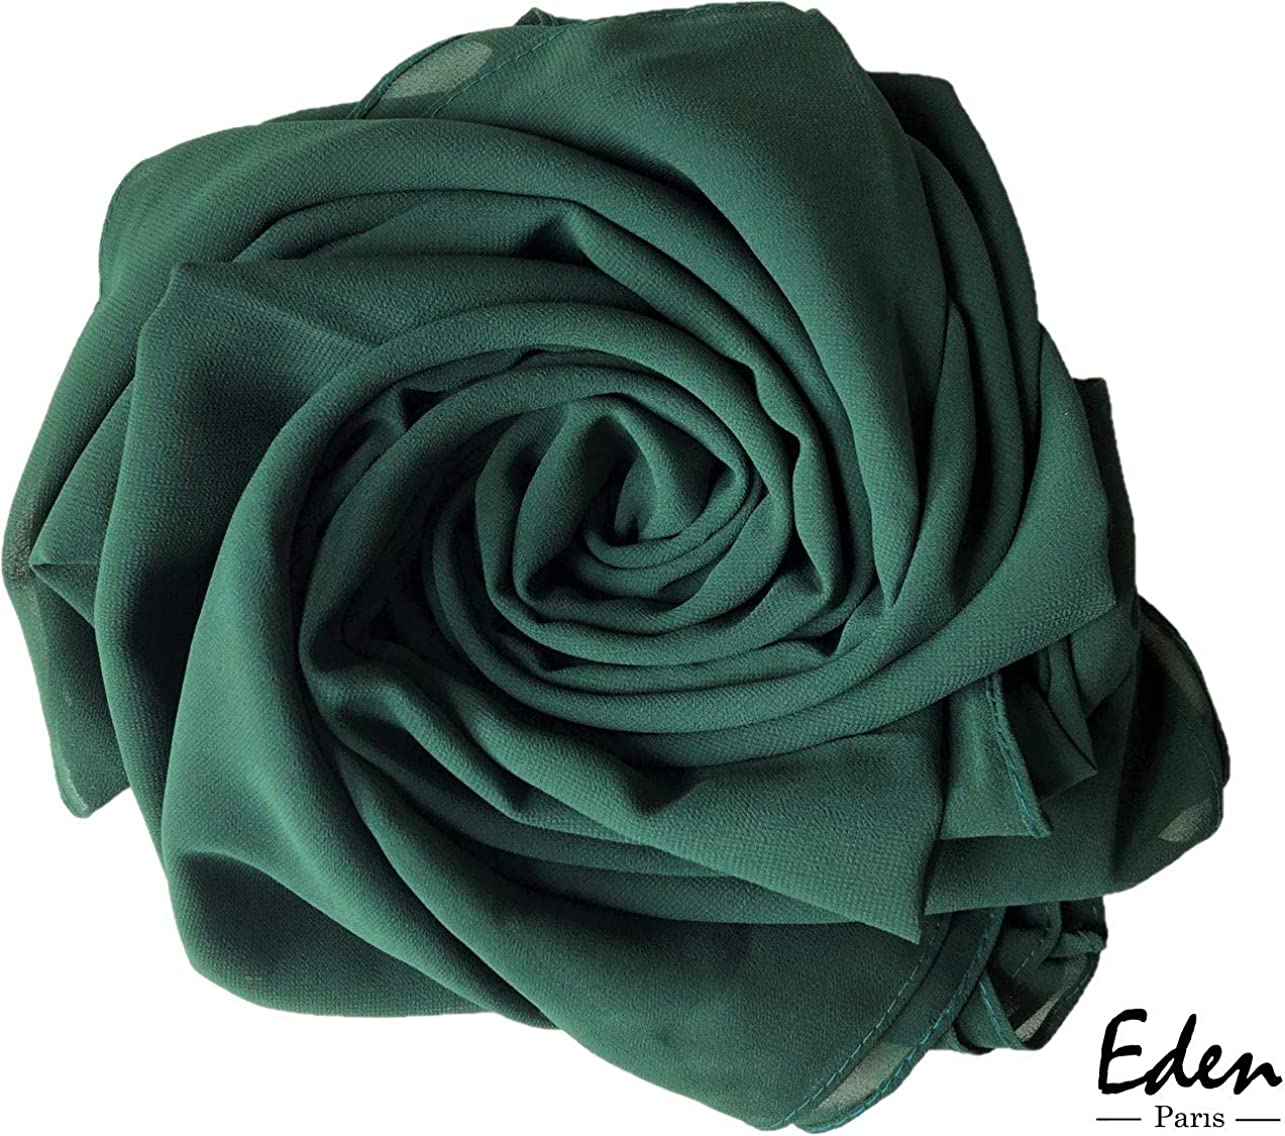 Pa/ñuelo Hijab para mujer vellada I Foulard isl/ámico moderno I muselina fluida y antideslizante I color liso I 75 x 180 cm EDEN Paris